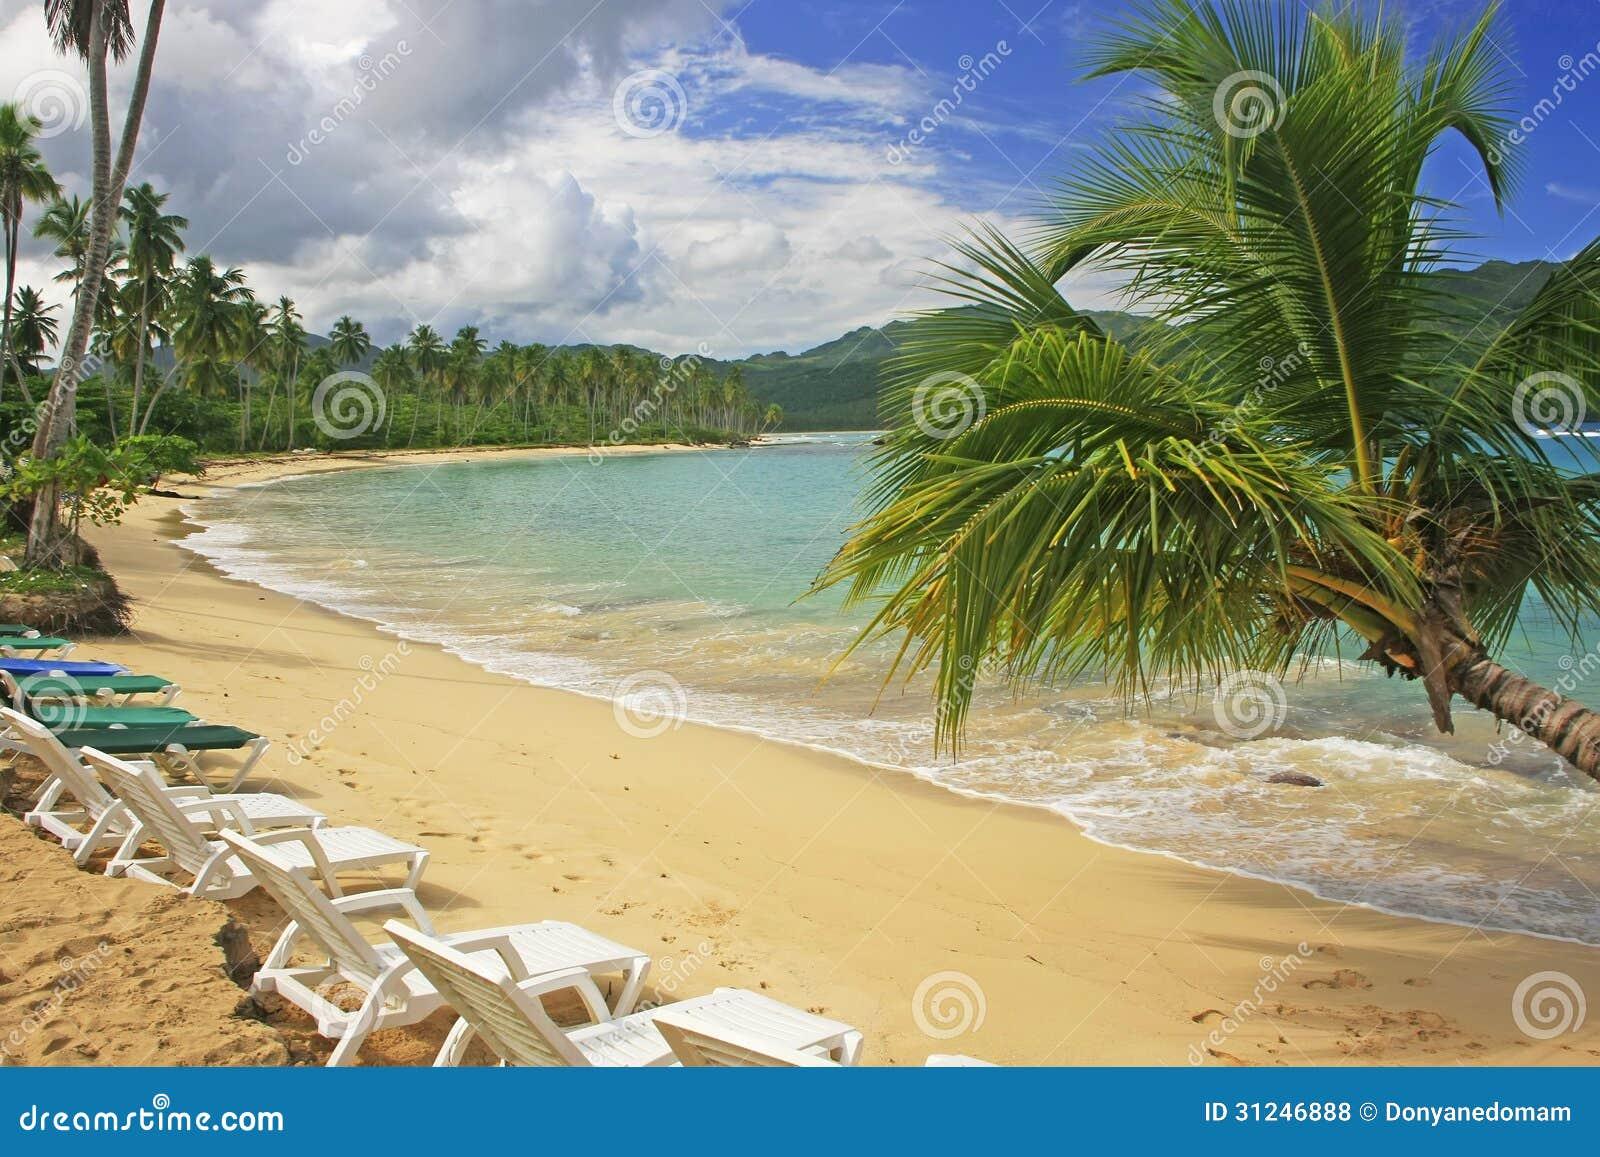 Leaning palm tree at Rincon beach, Samana peninsula